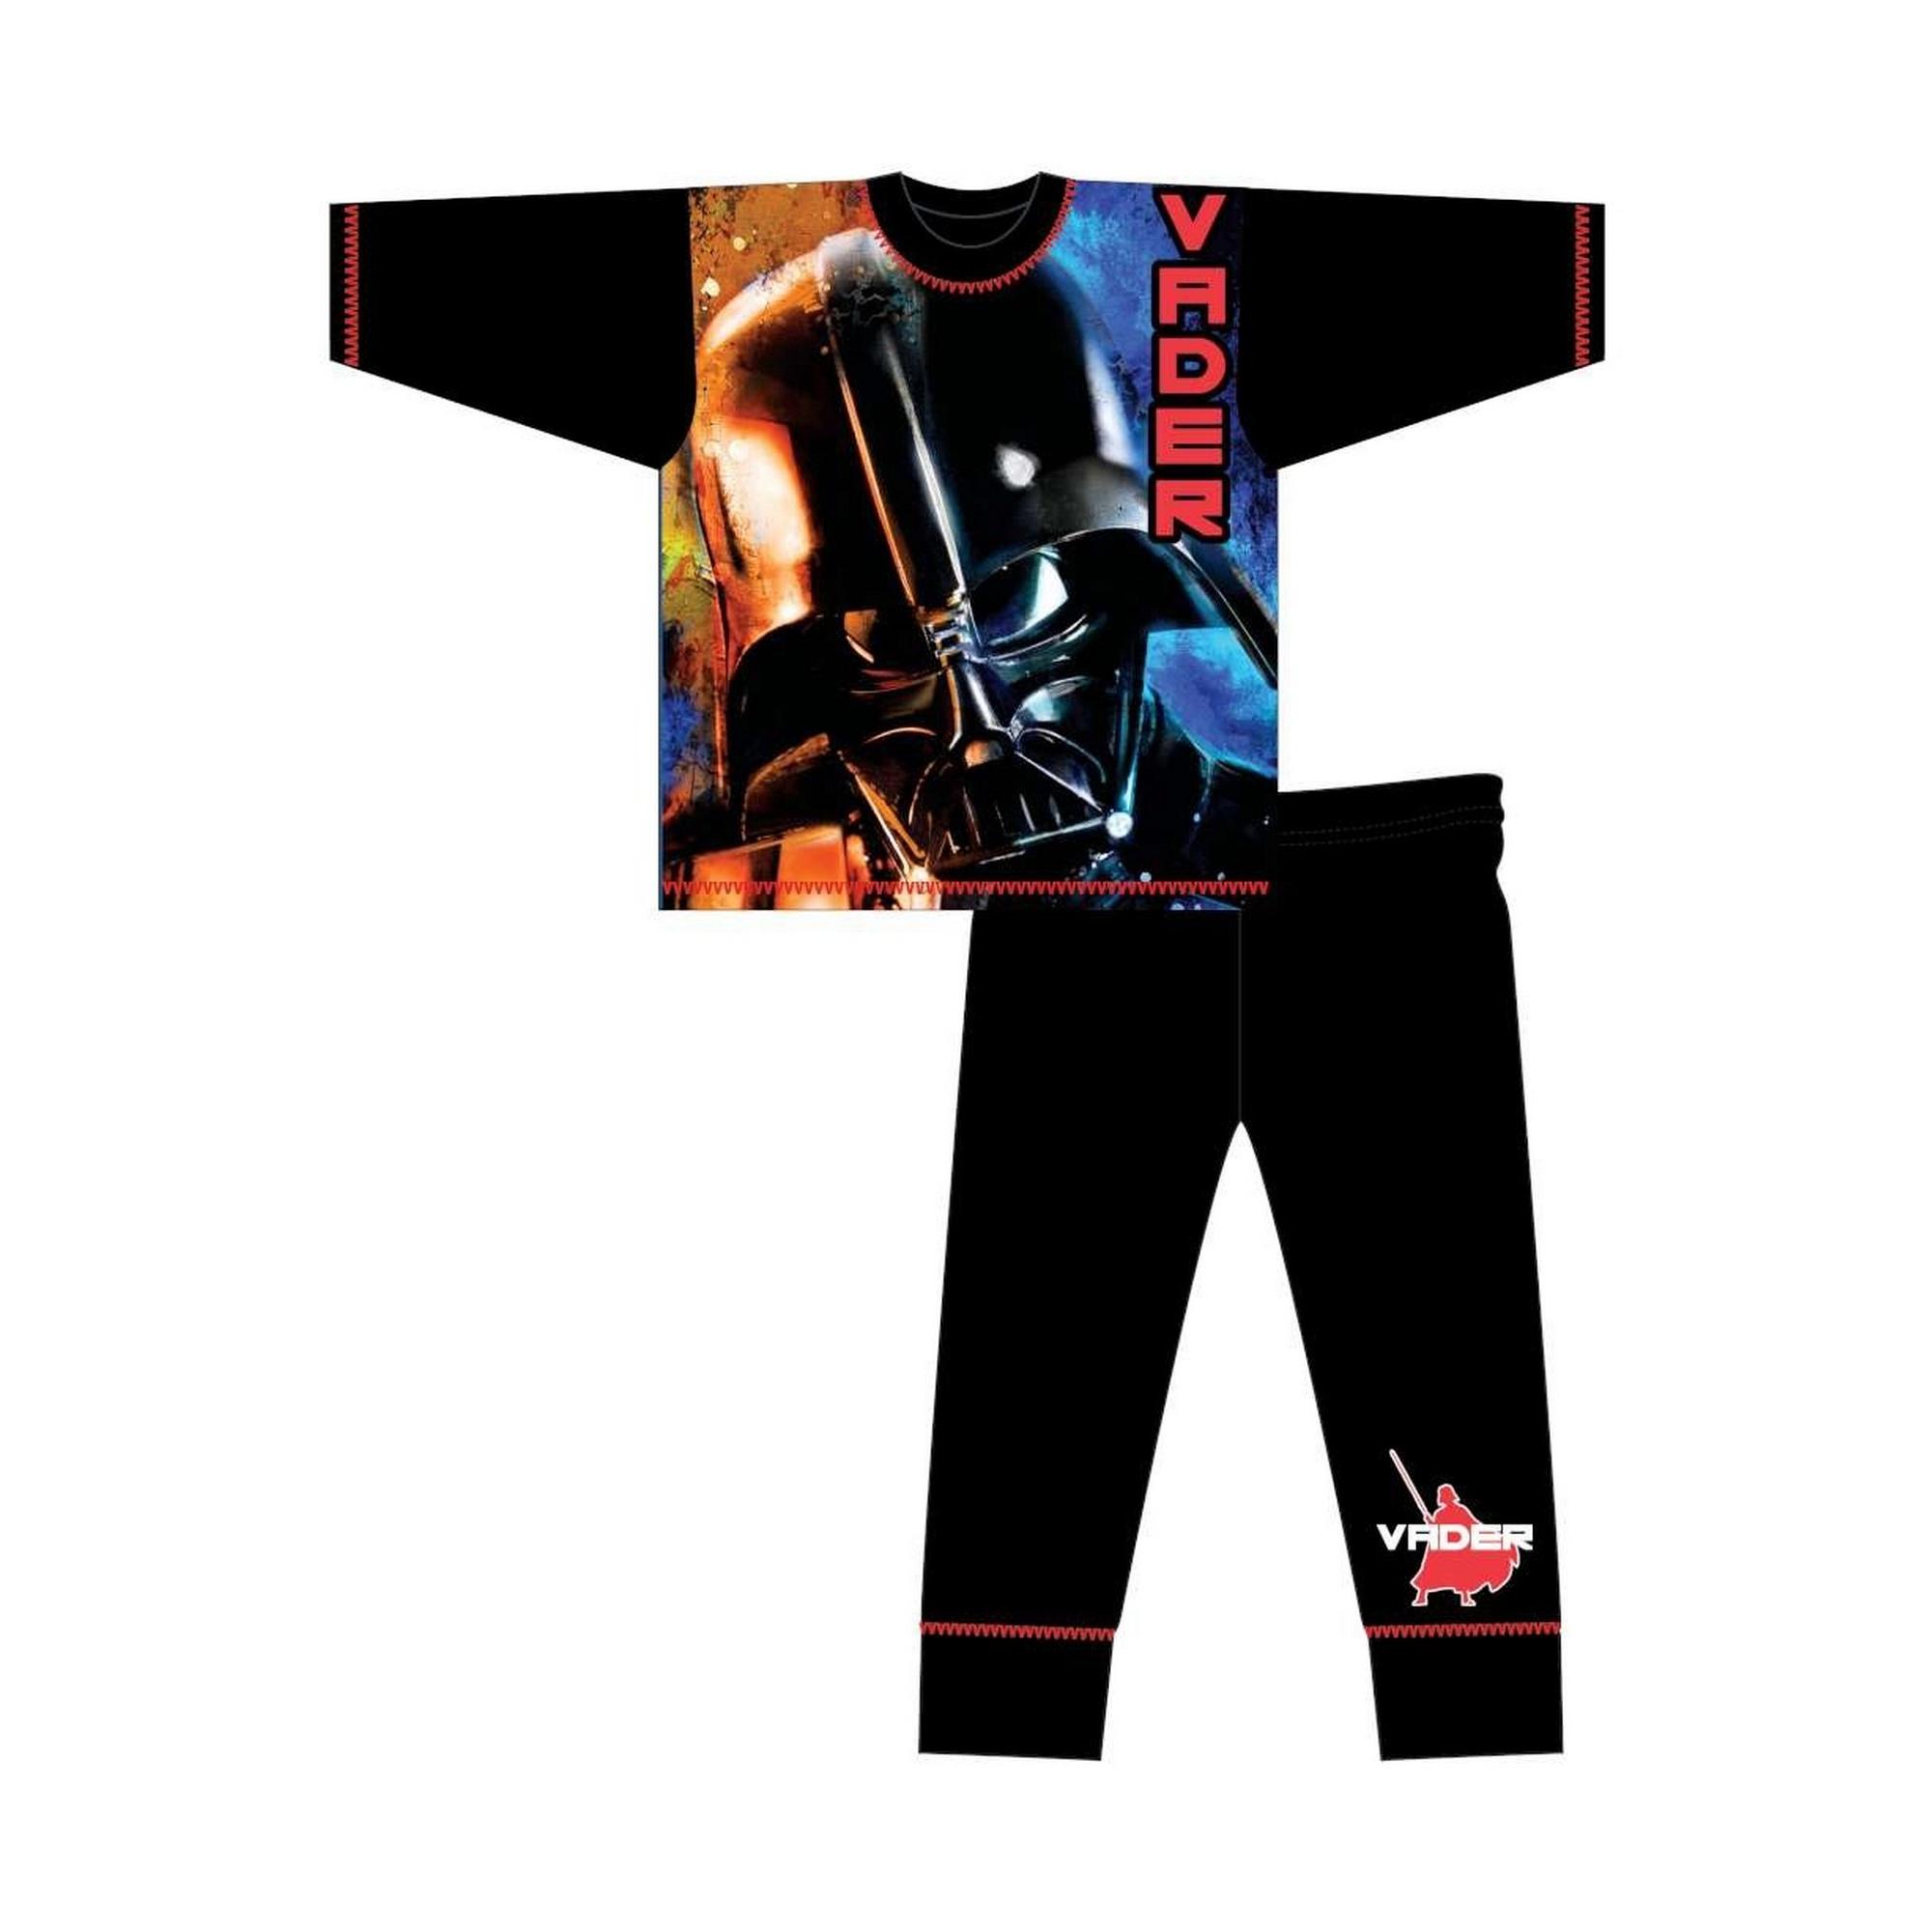 Star-Wars-Pijama-infantil-de-manga-larga-con-diseno-de-Darth-Vader-TF486